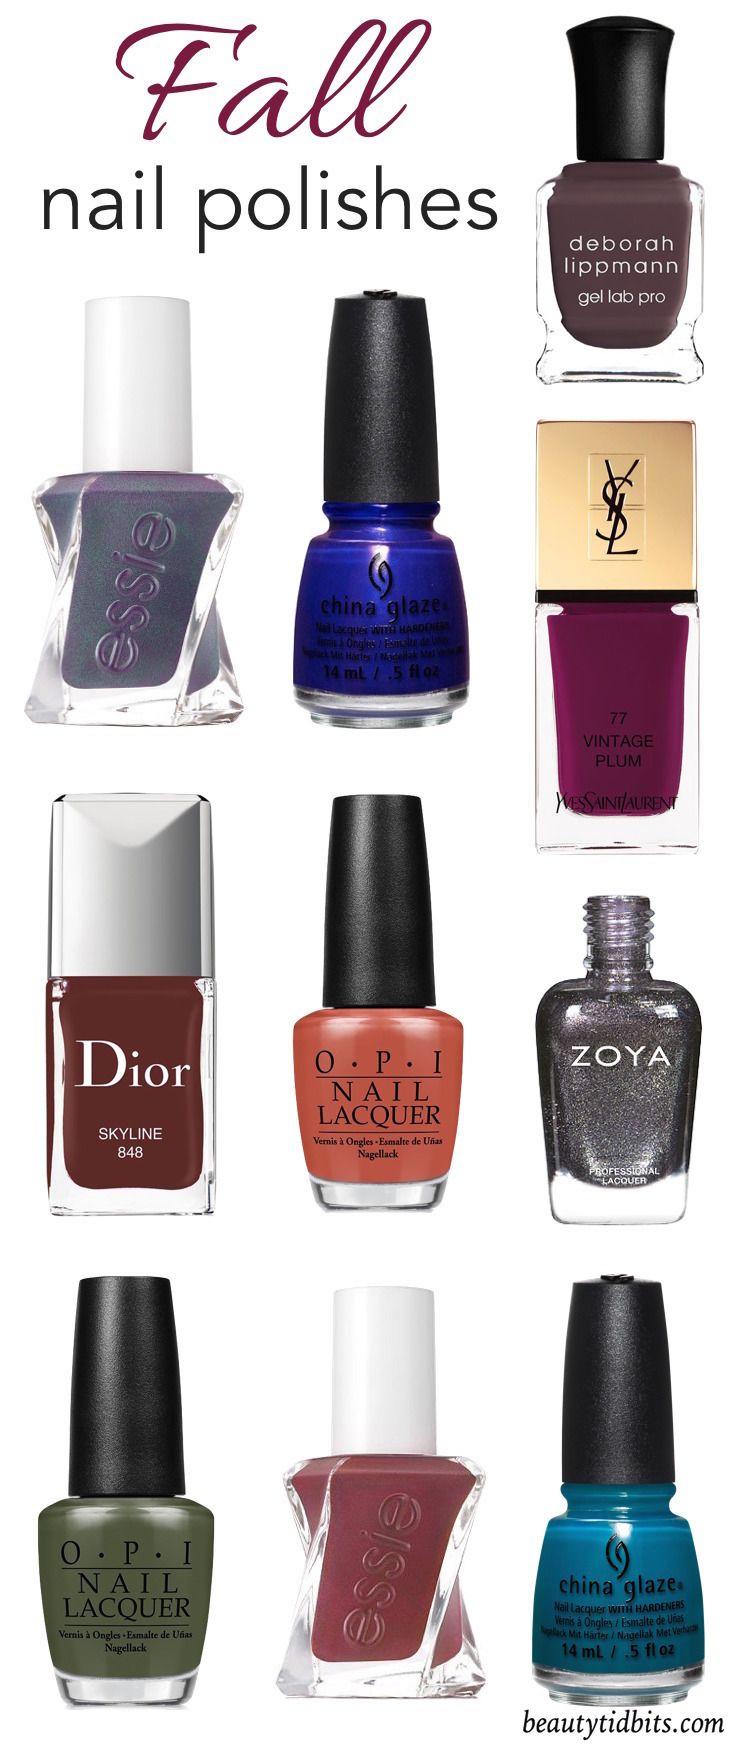 129 best Nails images on Pinterest | Fall nail colors, Nail polish ...